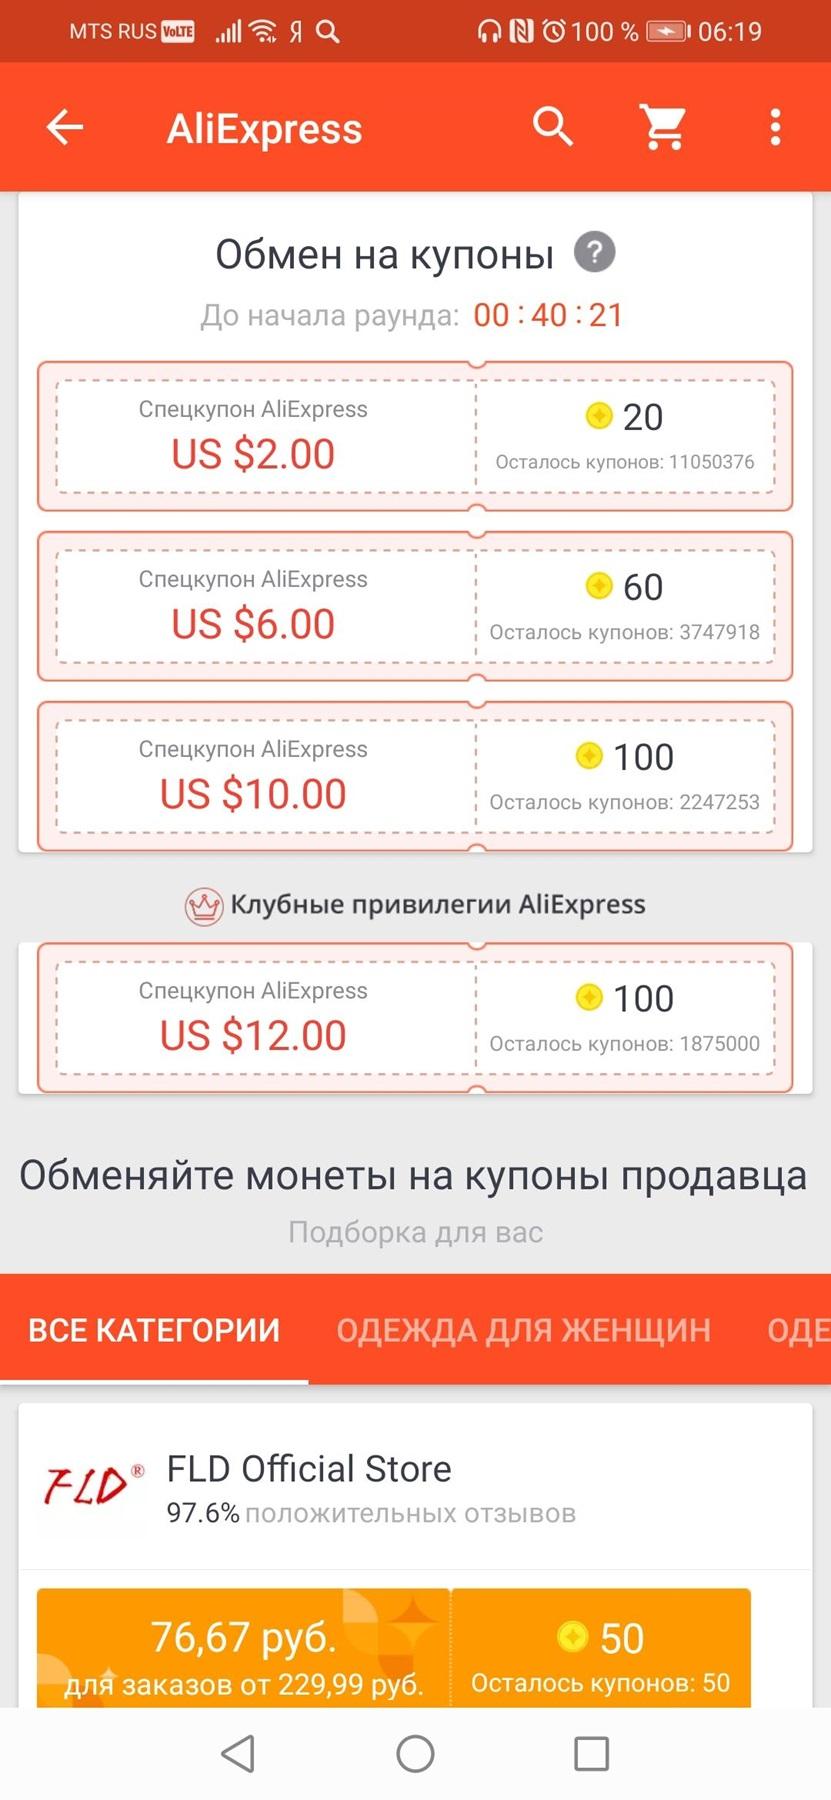 Обмен купонов на монеты